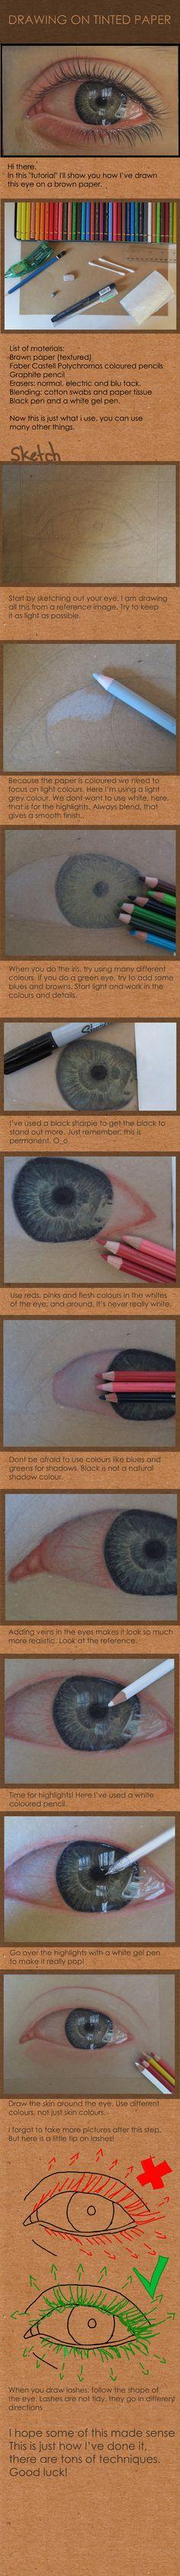 Drawing on tinted paper: Eye by acjub.deviantart.com on @deviantART